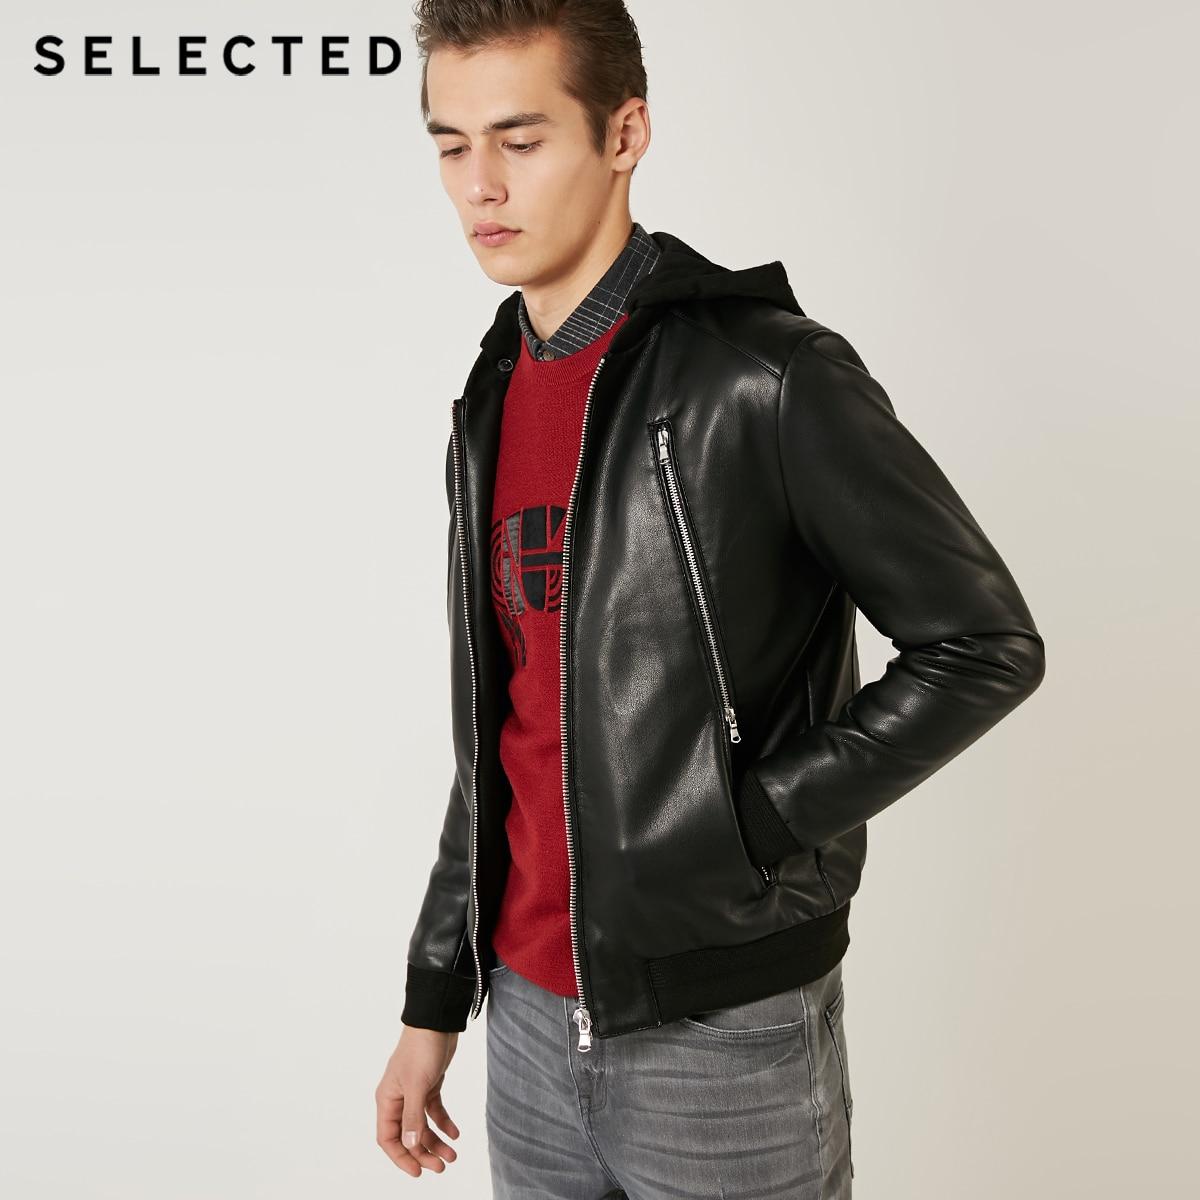 SELECTED Men's Regular Fit Coat Detachable Hood Zipper PU Leather Jacket S | 4191P3515